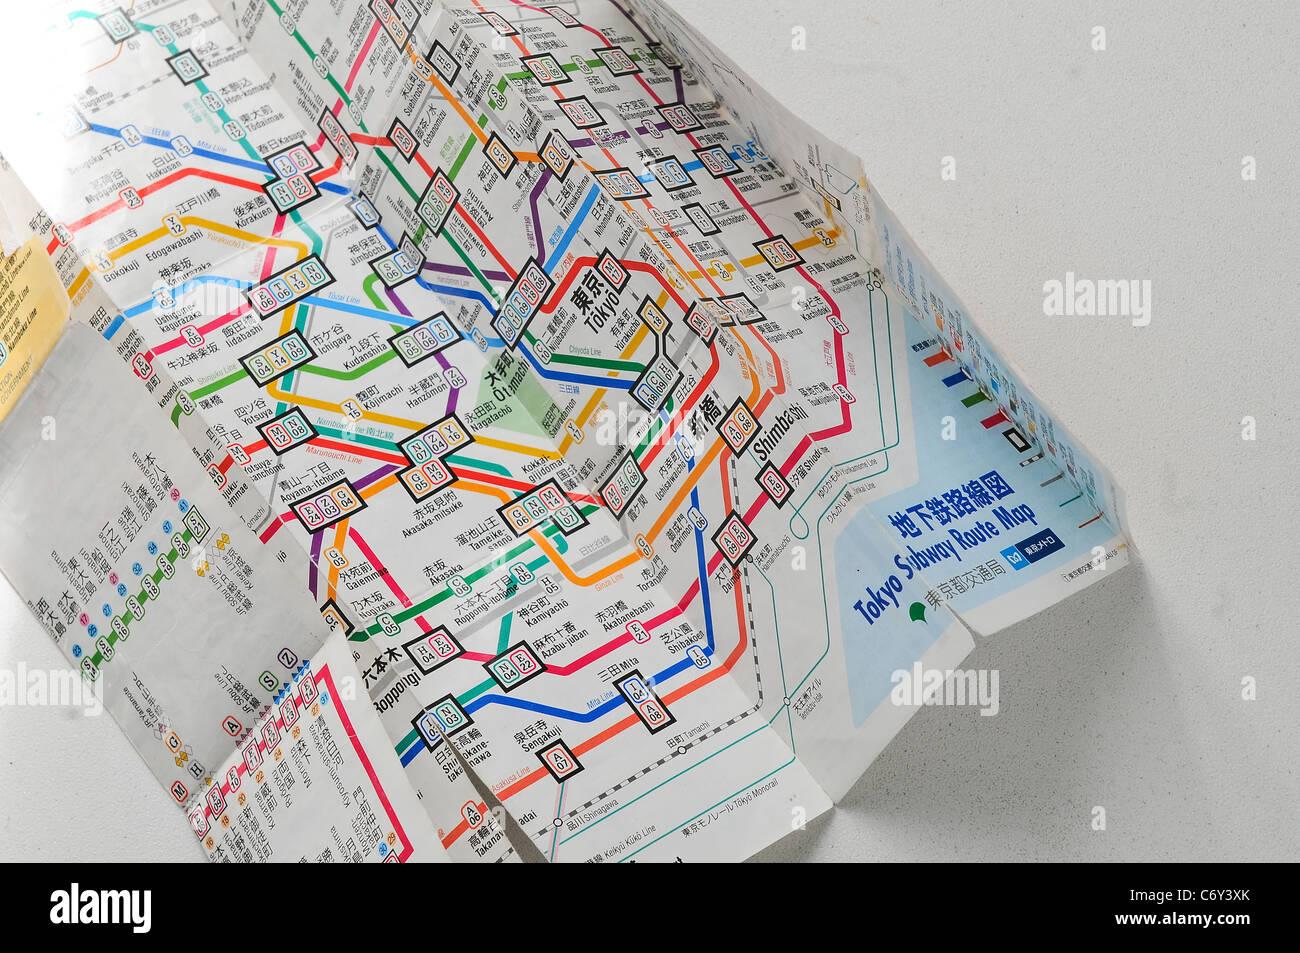 Aoyama Itchome On Subway Map.Tokyo Subway Map Stock Photos Tokyo Subway Map Stock Images Alamy